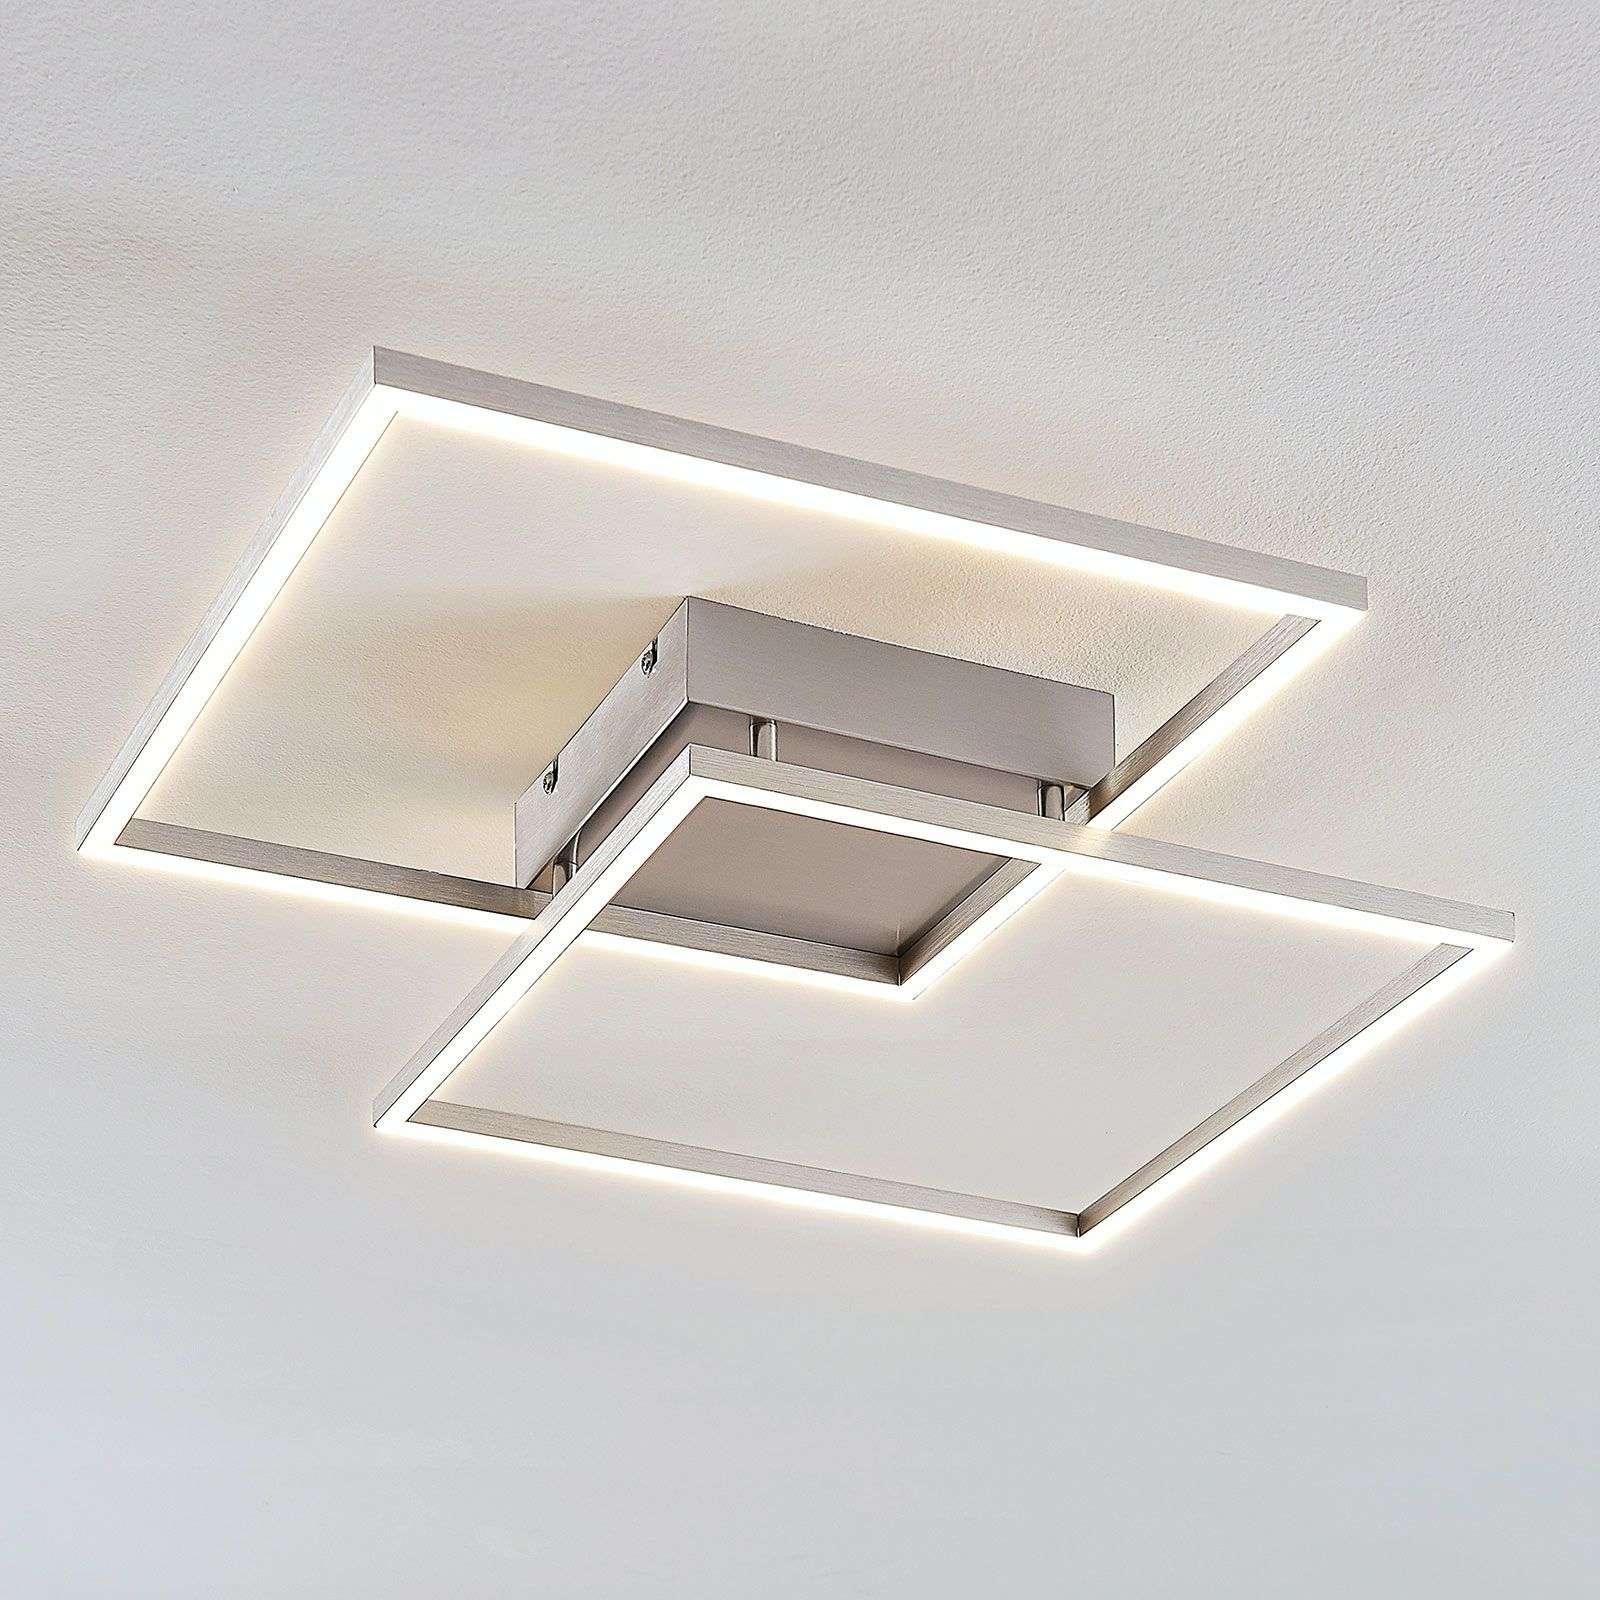 Lampenwelt.com Plafonnier LED Mirac au design intéressant - LAMPENWELT.com